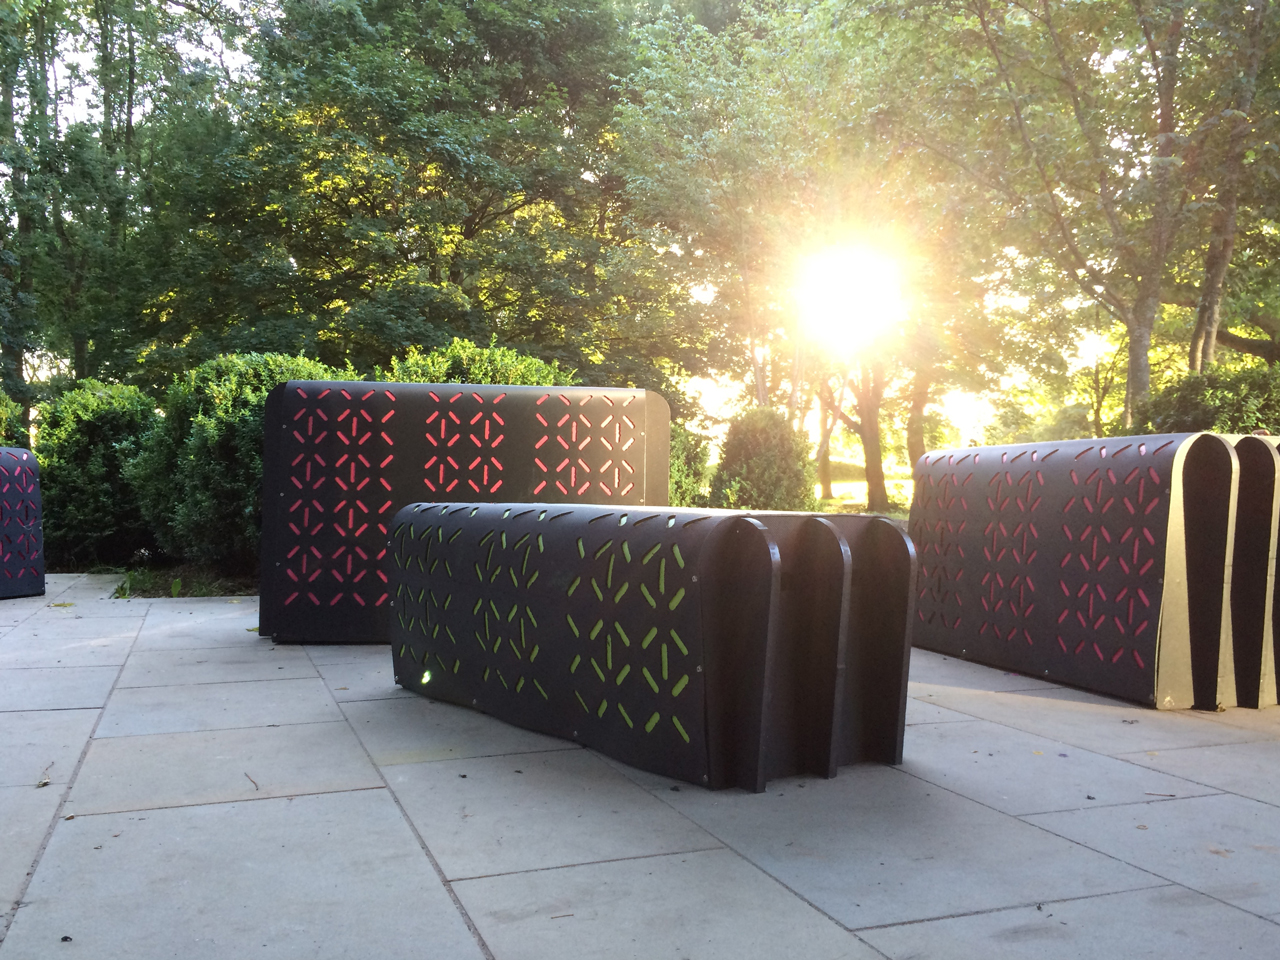 Outdoor_furniture_Design_Competition_winning14.jpg